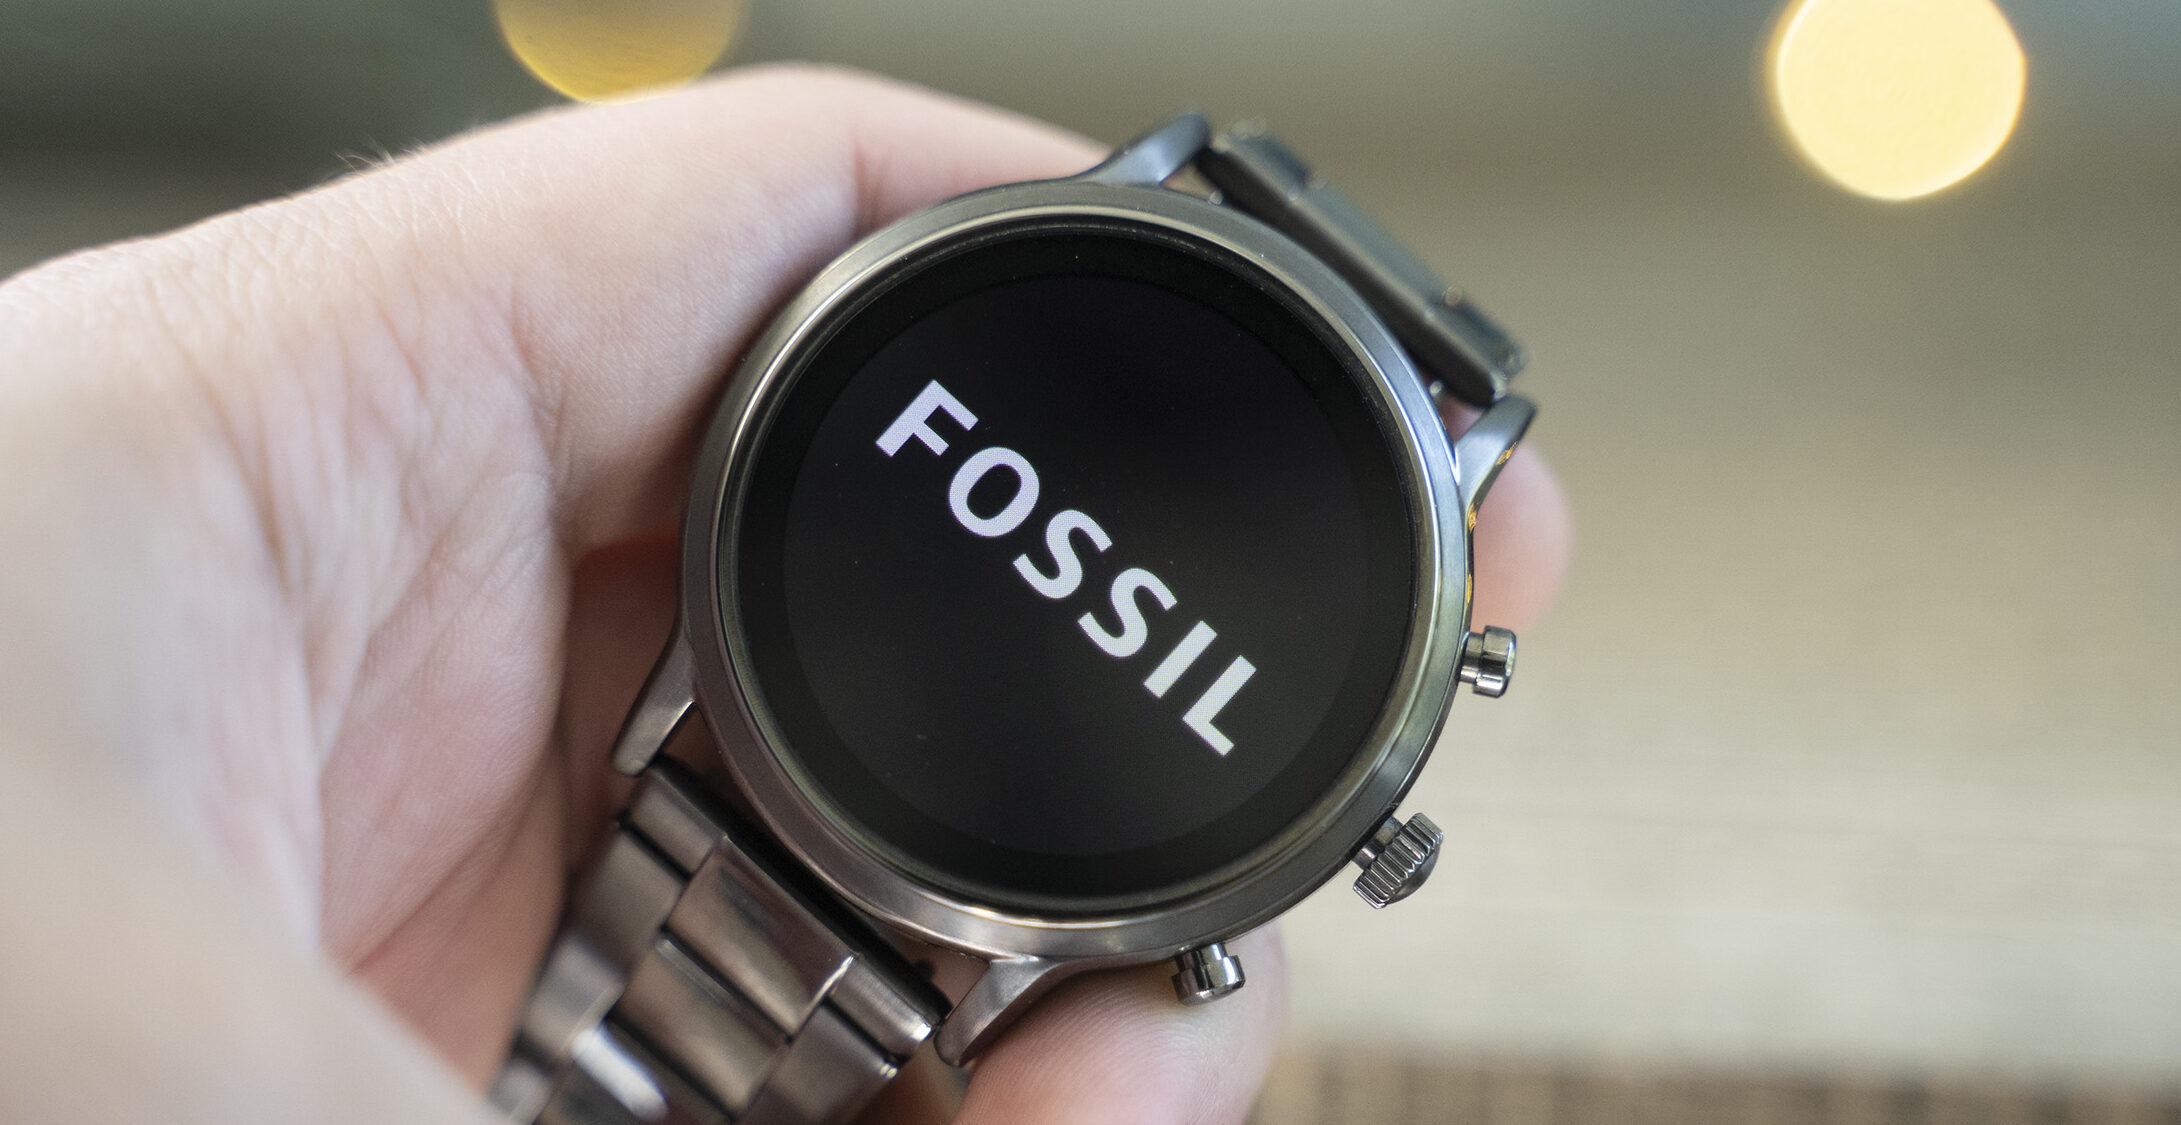 a-atualizacao-do-fossil-gen-5-eliminou-alguns-watchfaces